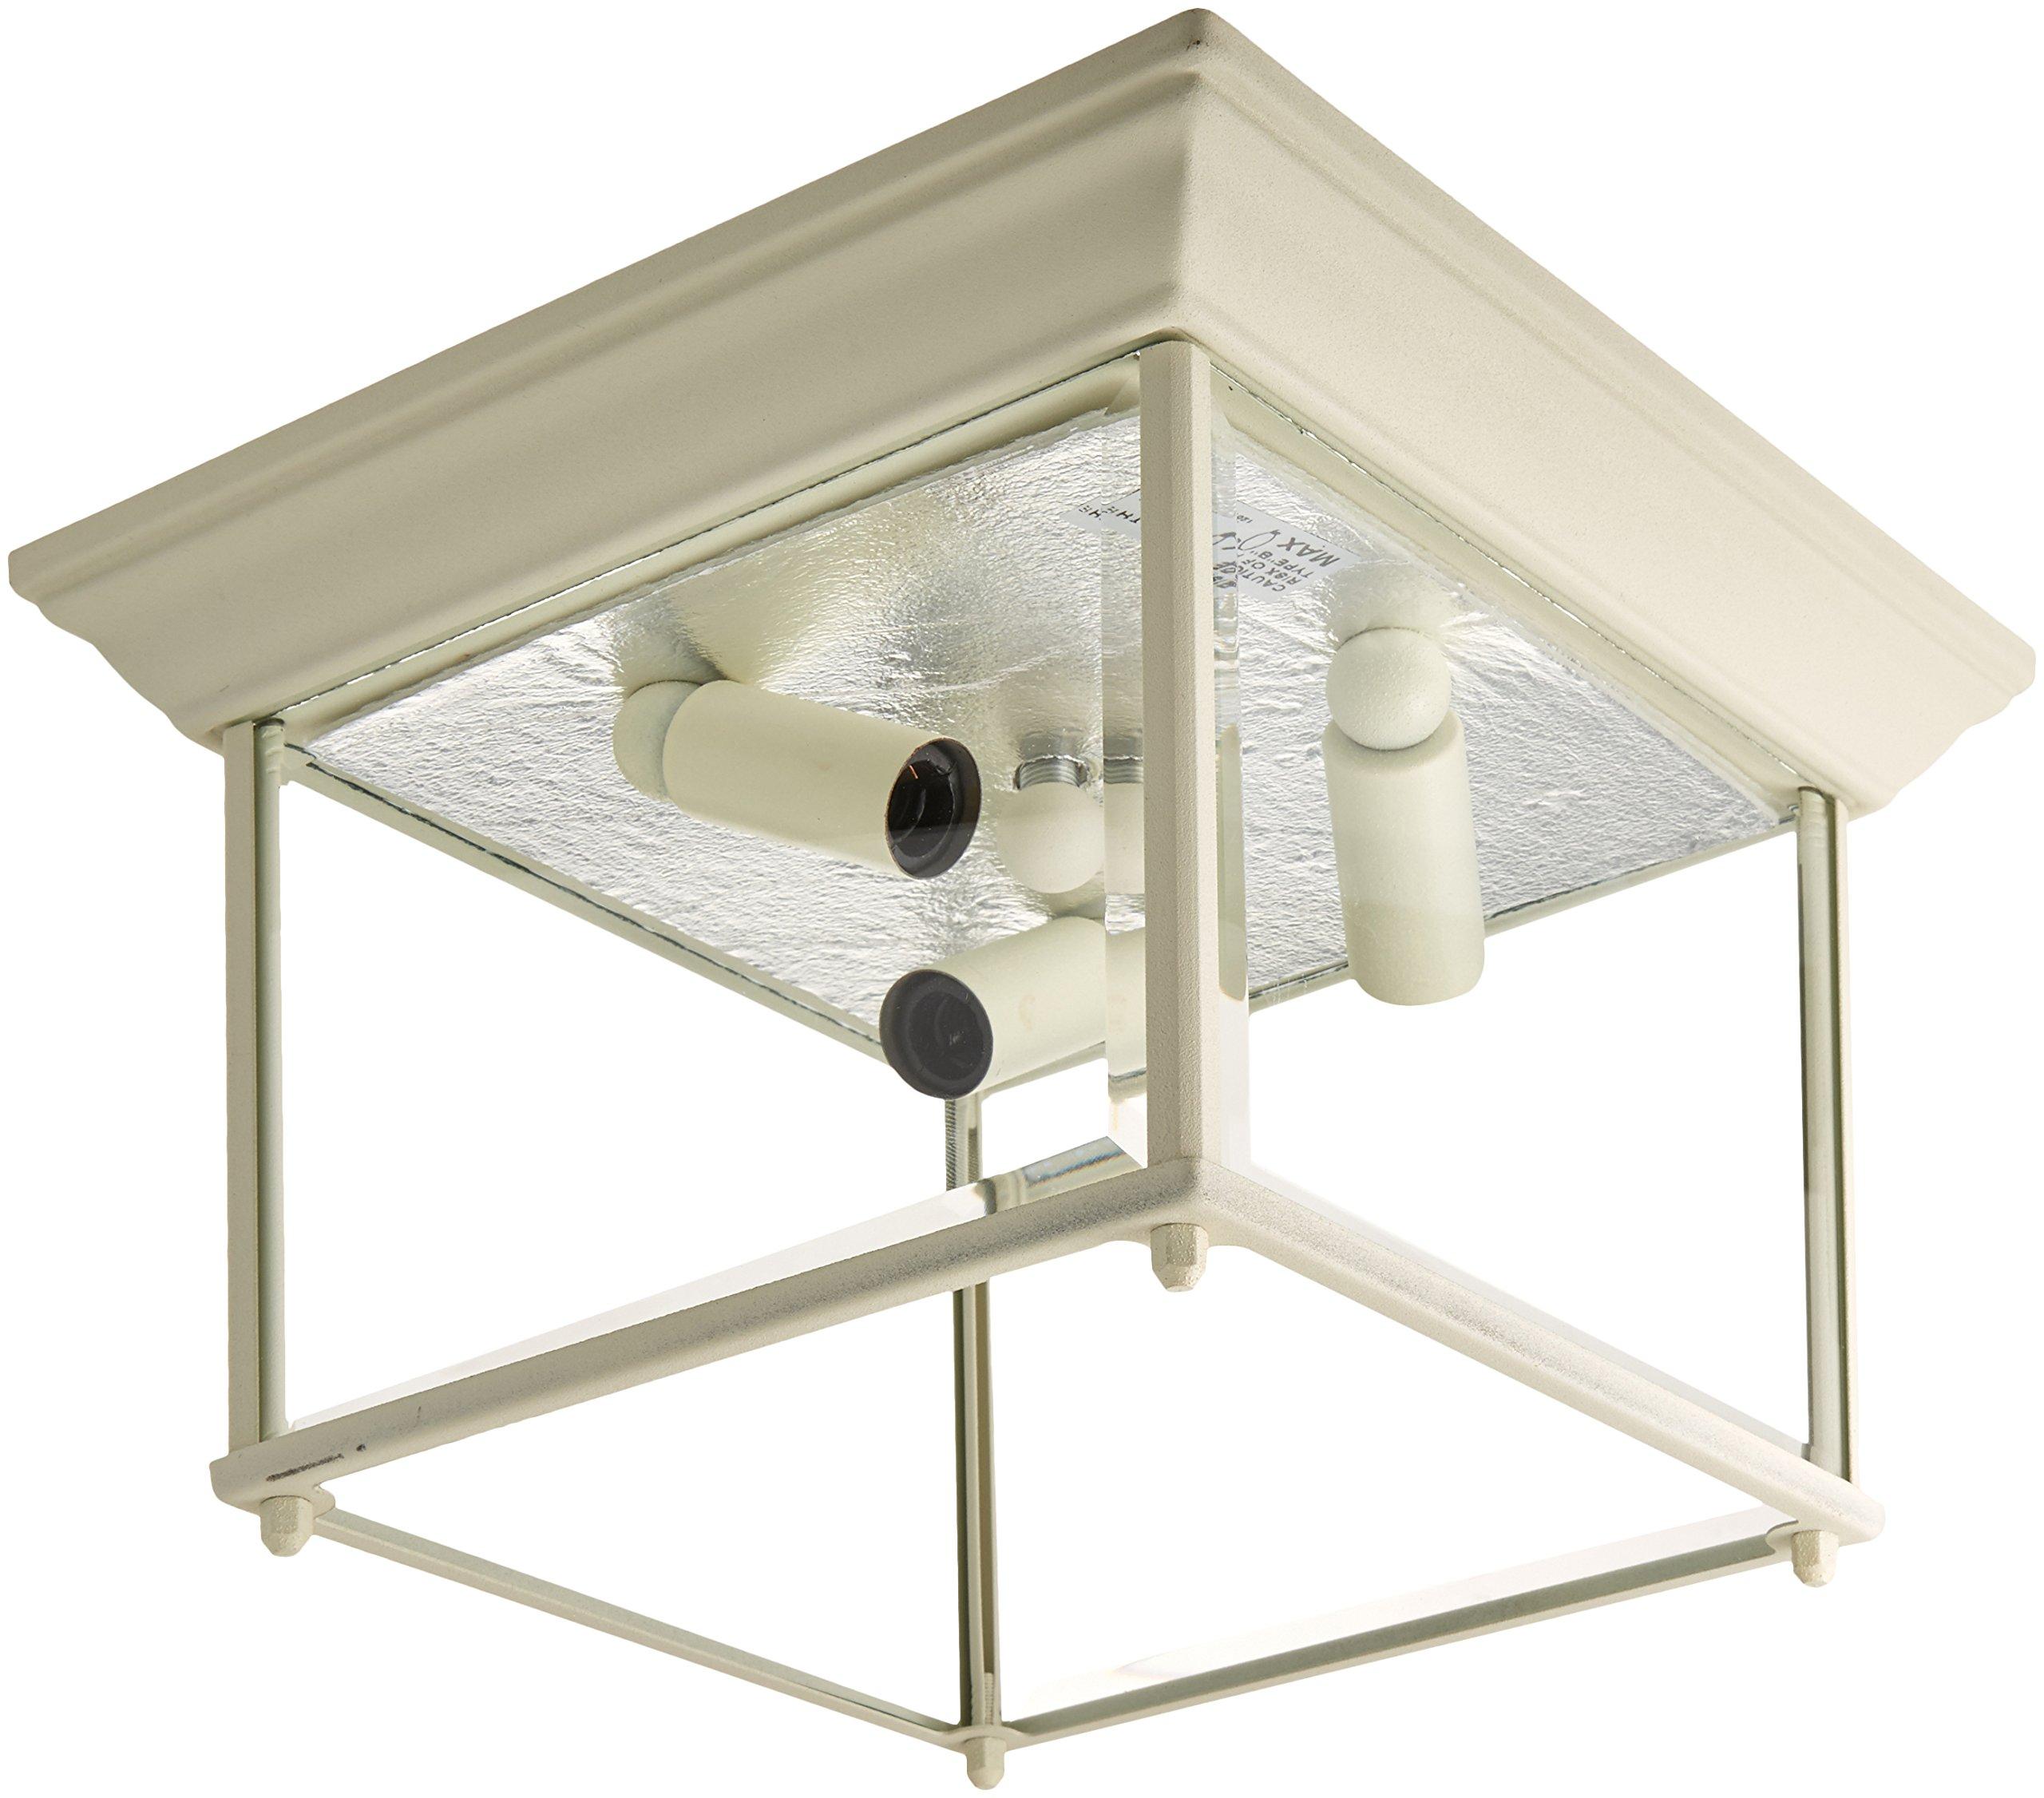 Trans Globe Lighting 4905 WH Outdoor Ansel 6.5'' Flushmount Lantern, White